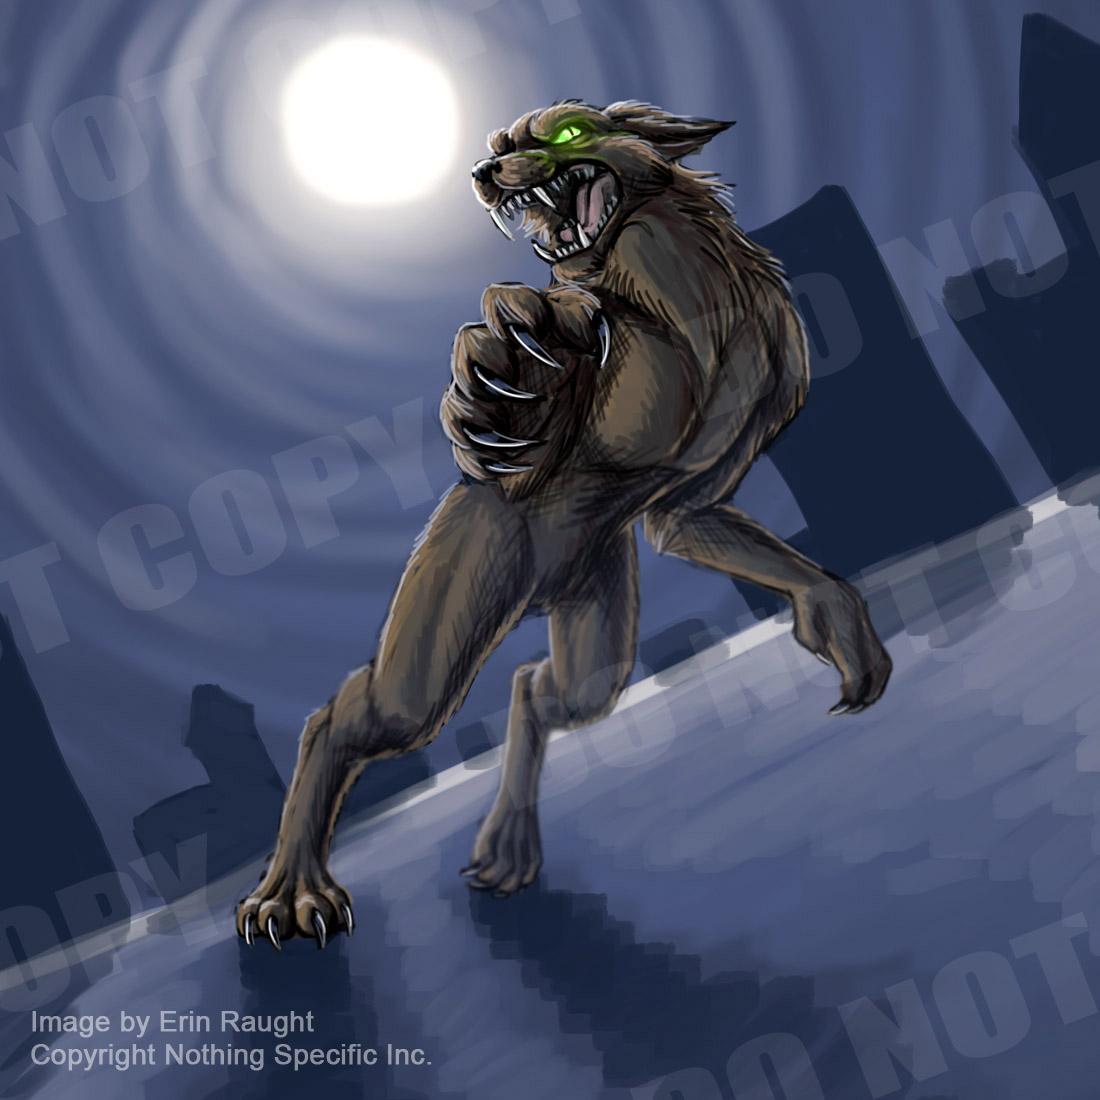 7180 - Werewolf - Wolf man - Worgen - Full Moon - Halloween - Scary.jpg